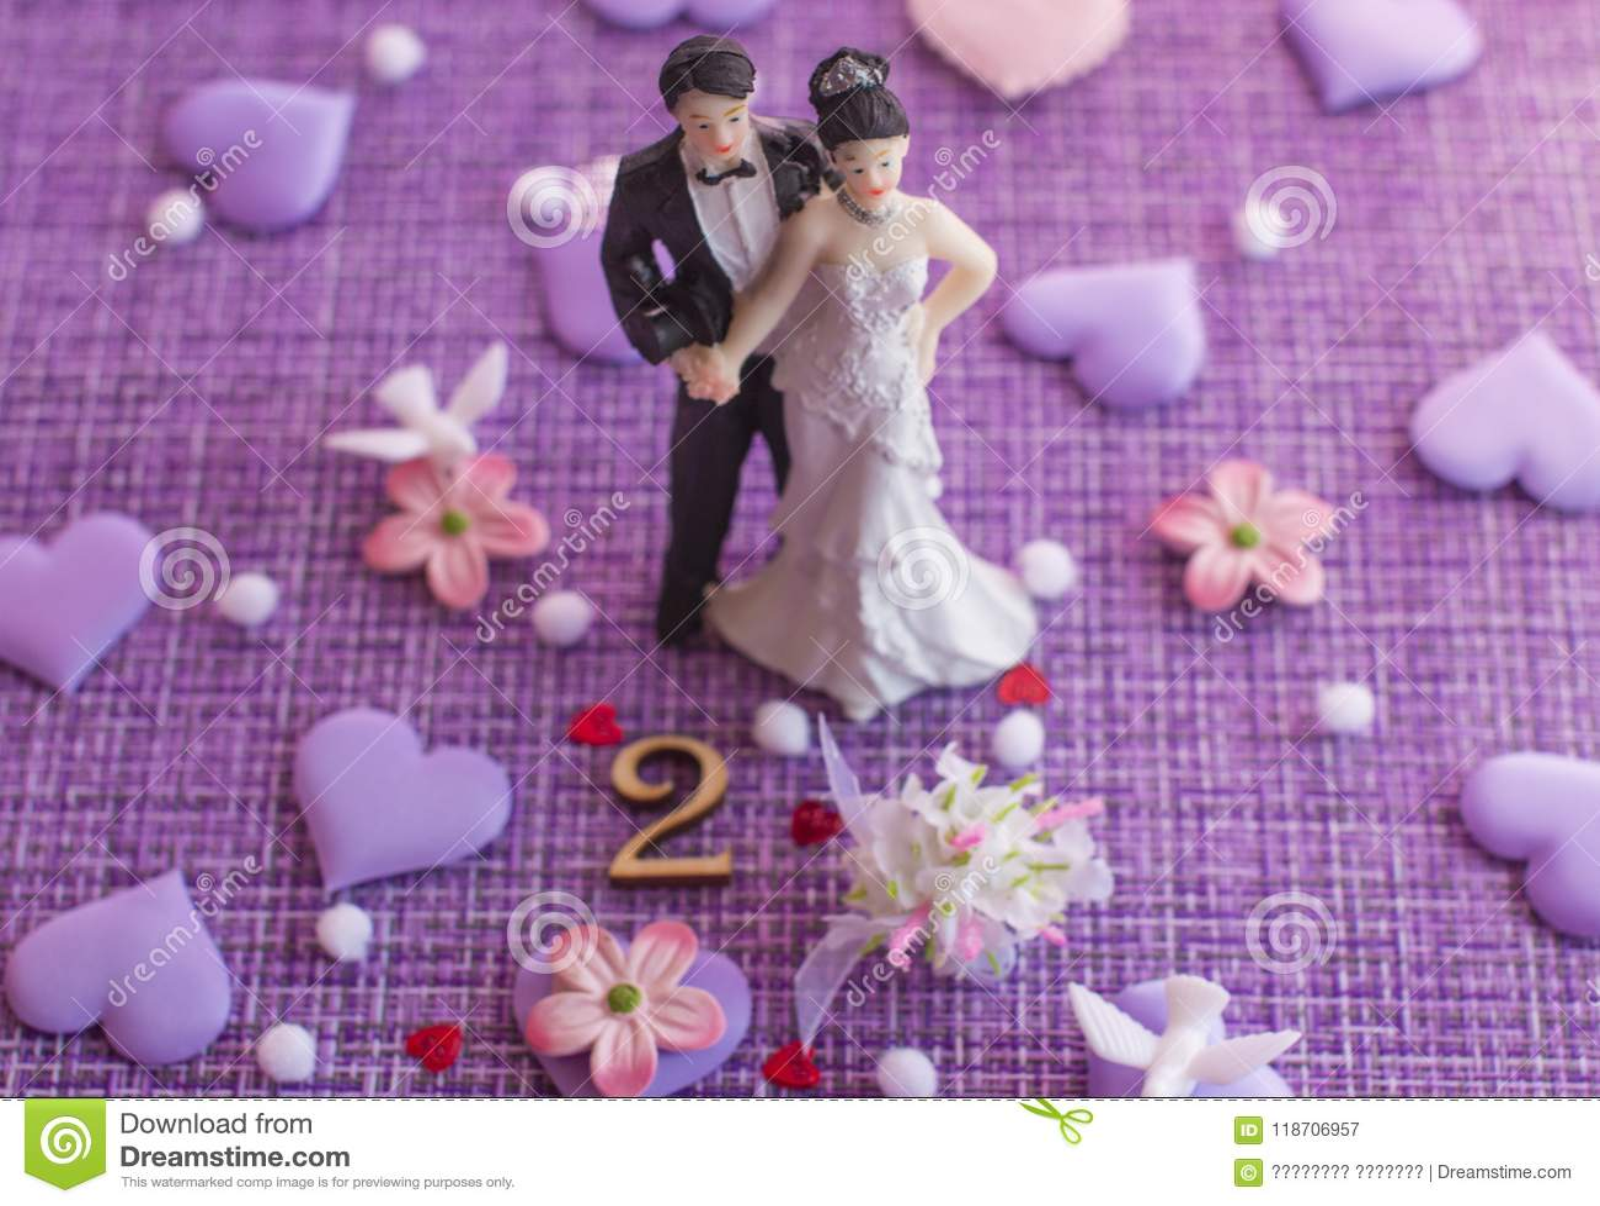 Wedding Anniversary Anniversary Stock Image Image Of Holiday